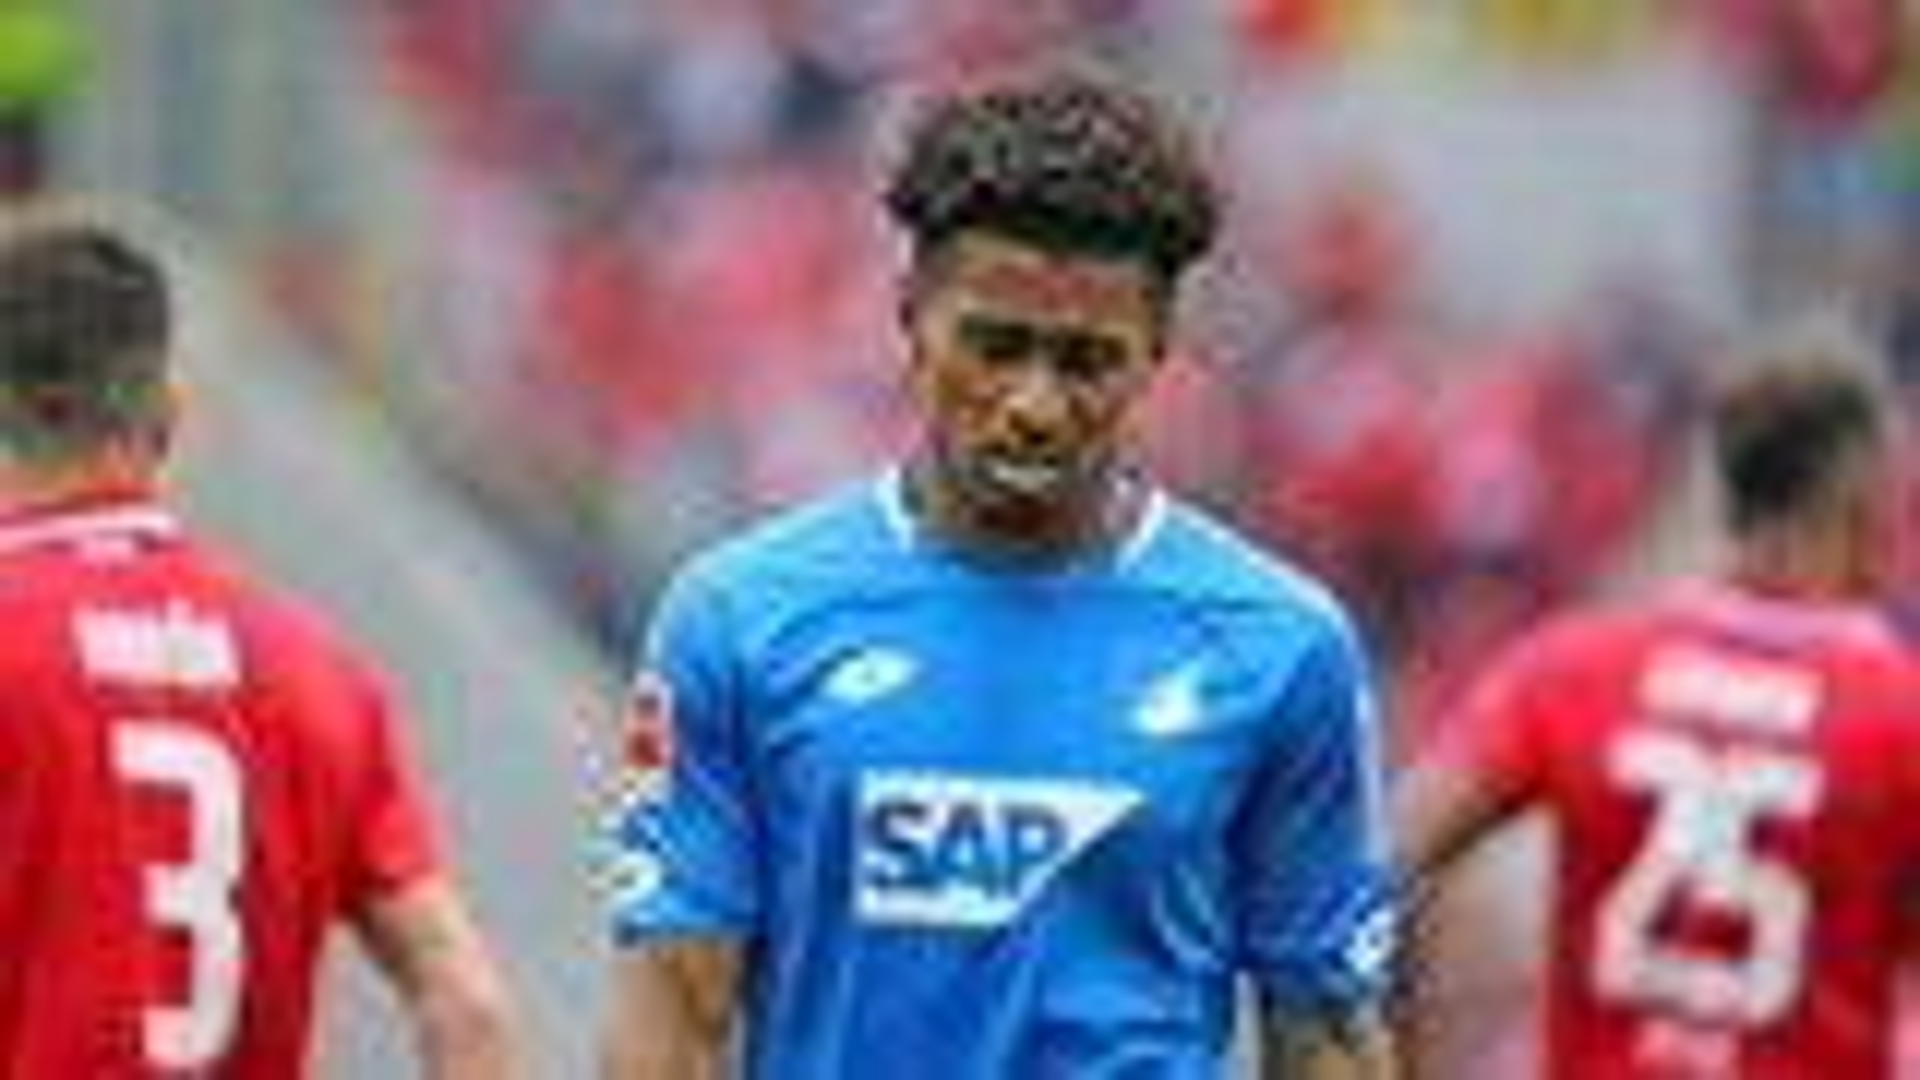 Hoffenheim miss out on Europe after Mainz defeat